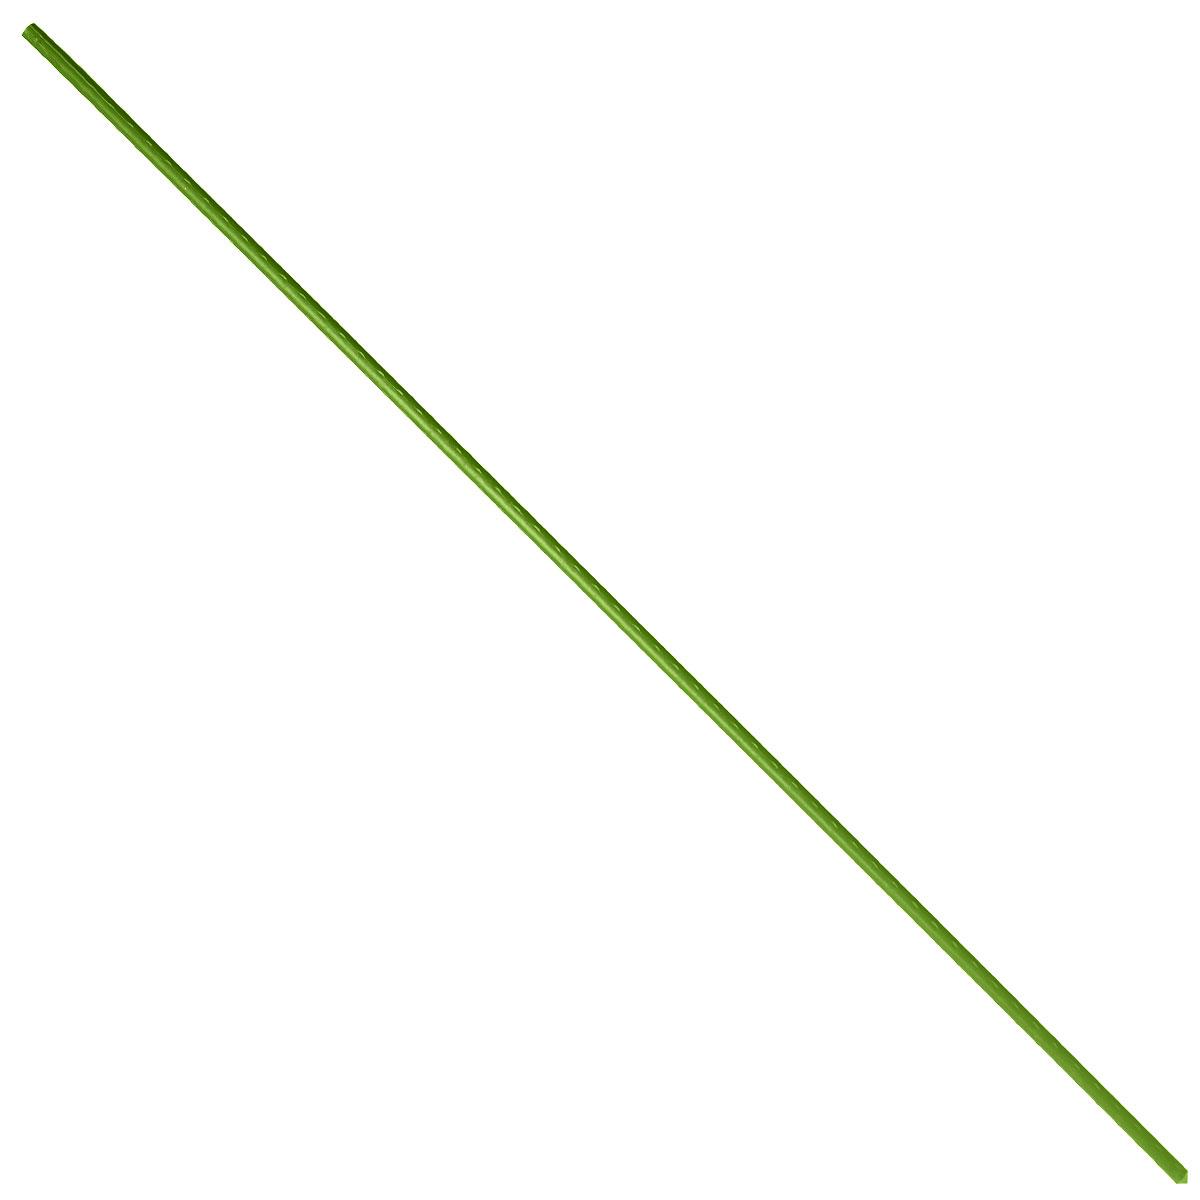 Опора для растений Green Apple, цвет: зеленый, диаметр 1,1 см, длина 90 см, 5 шт чехол для садовых растений green apple 100х50см